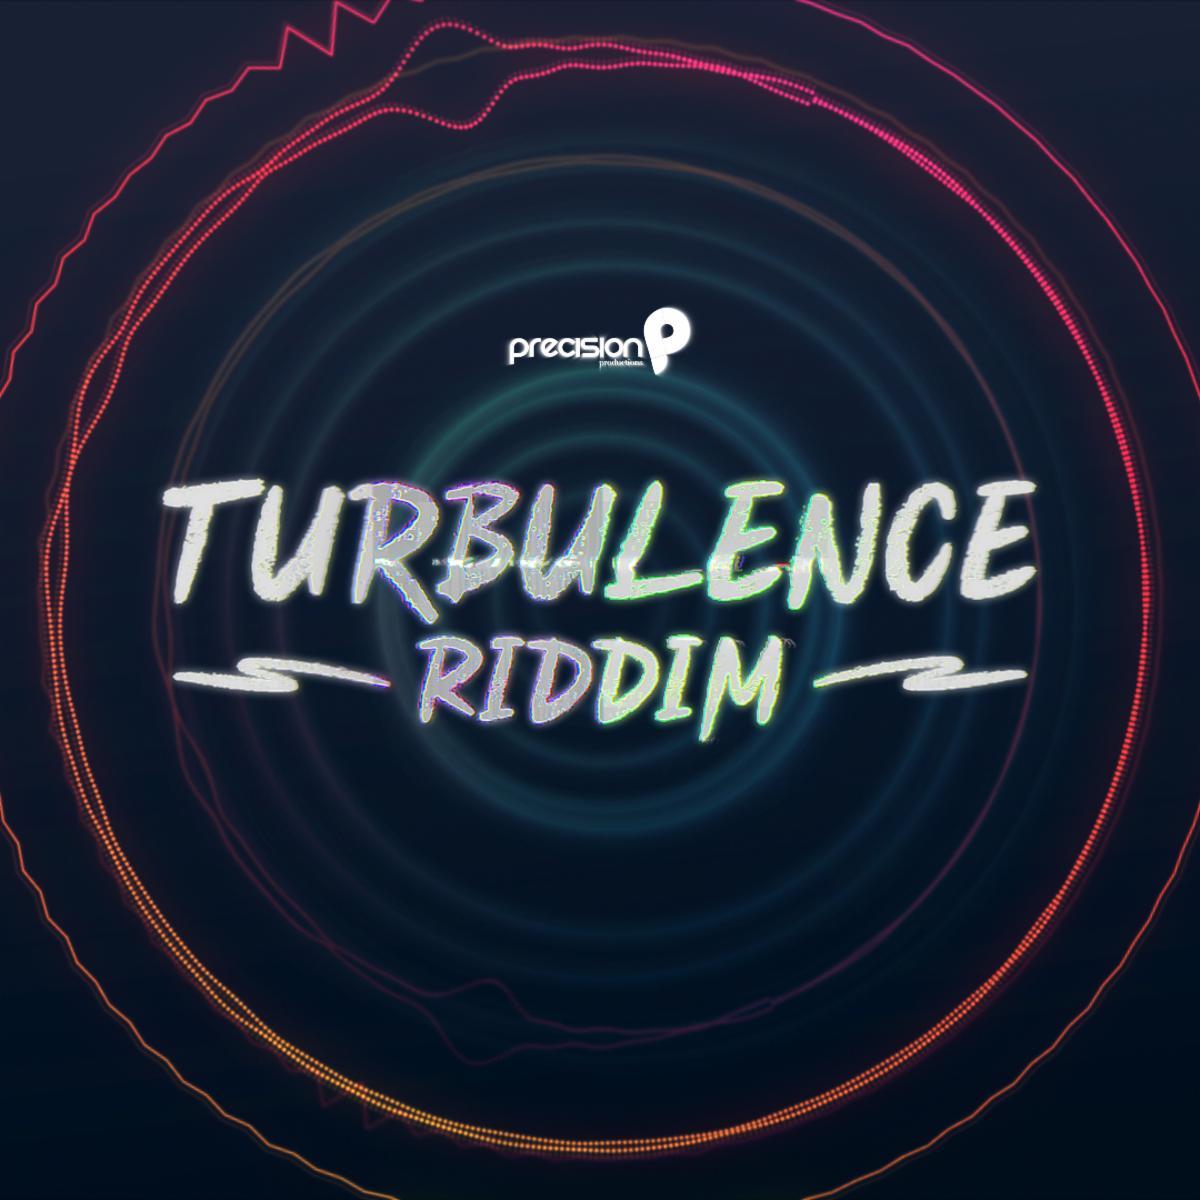 Turbulence Riddim